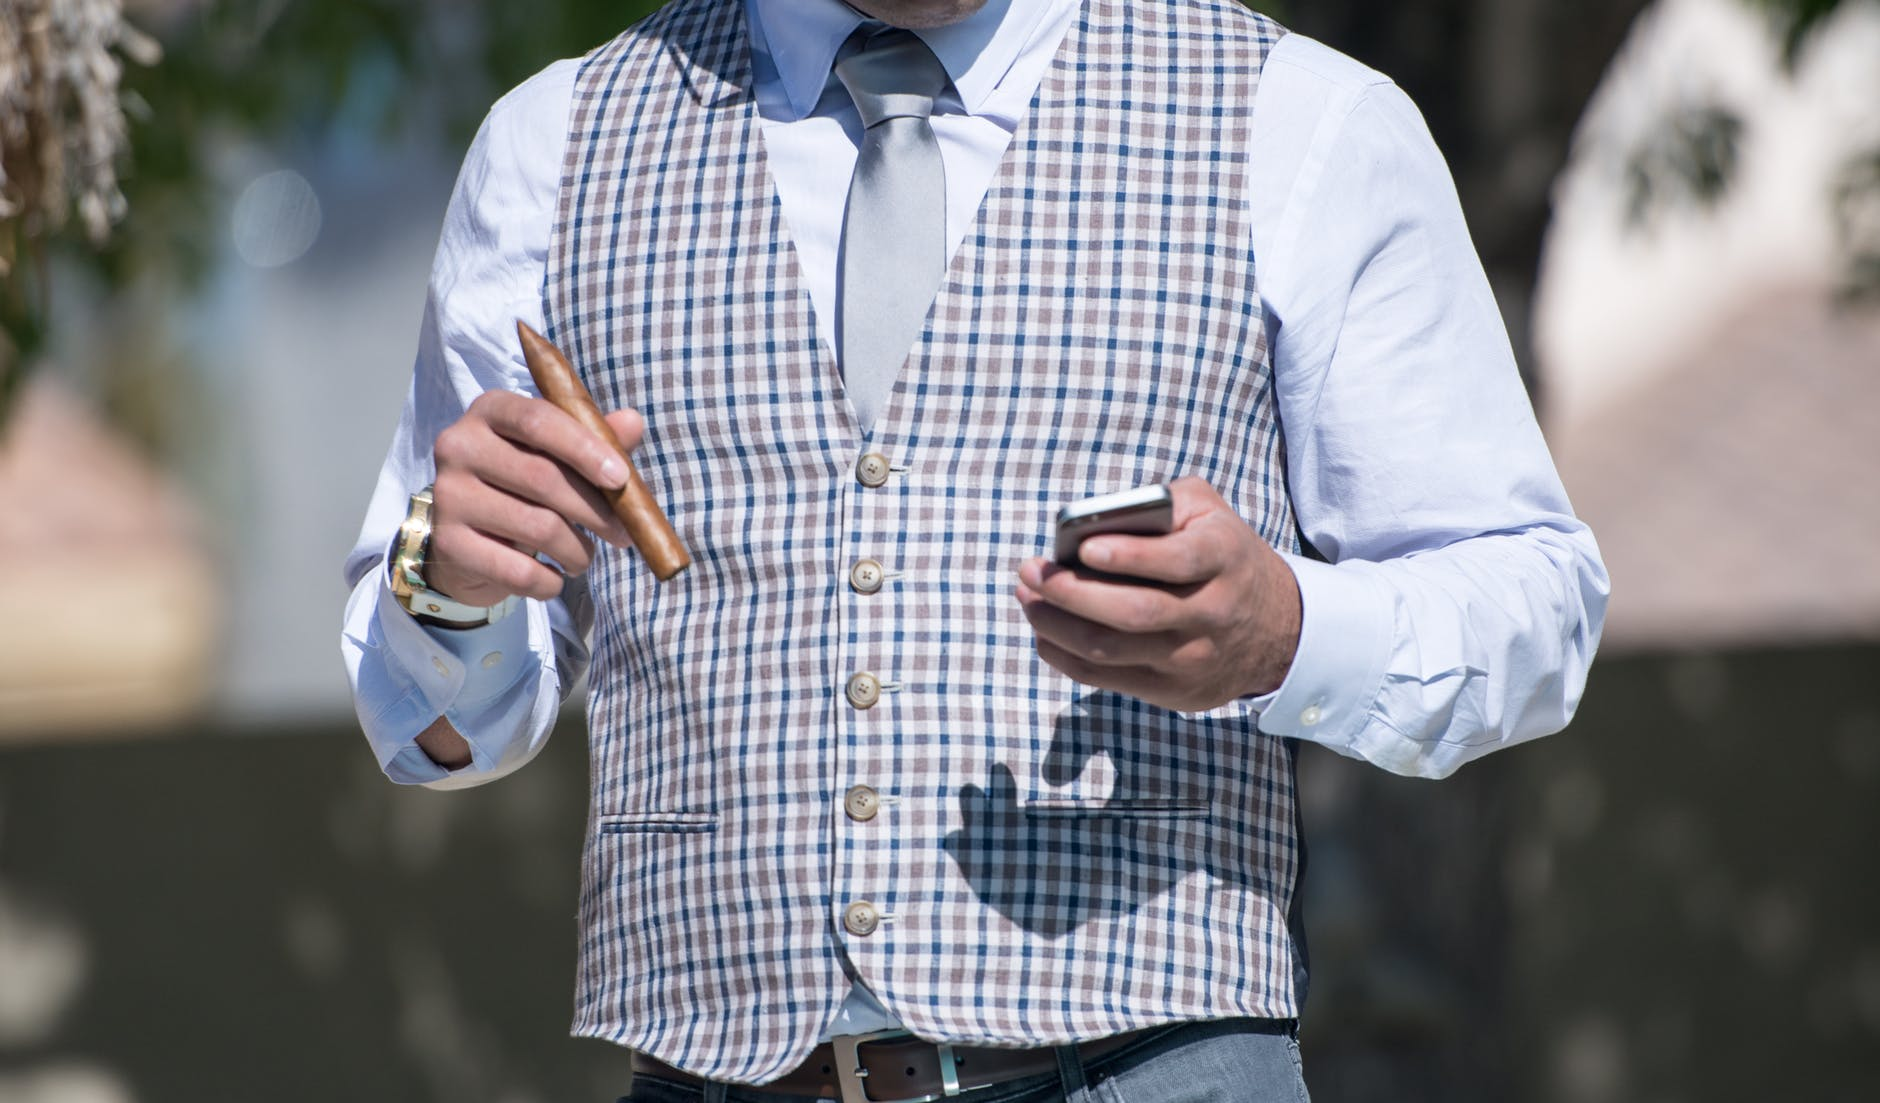 businessman-fashion-man-person.jpg